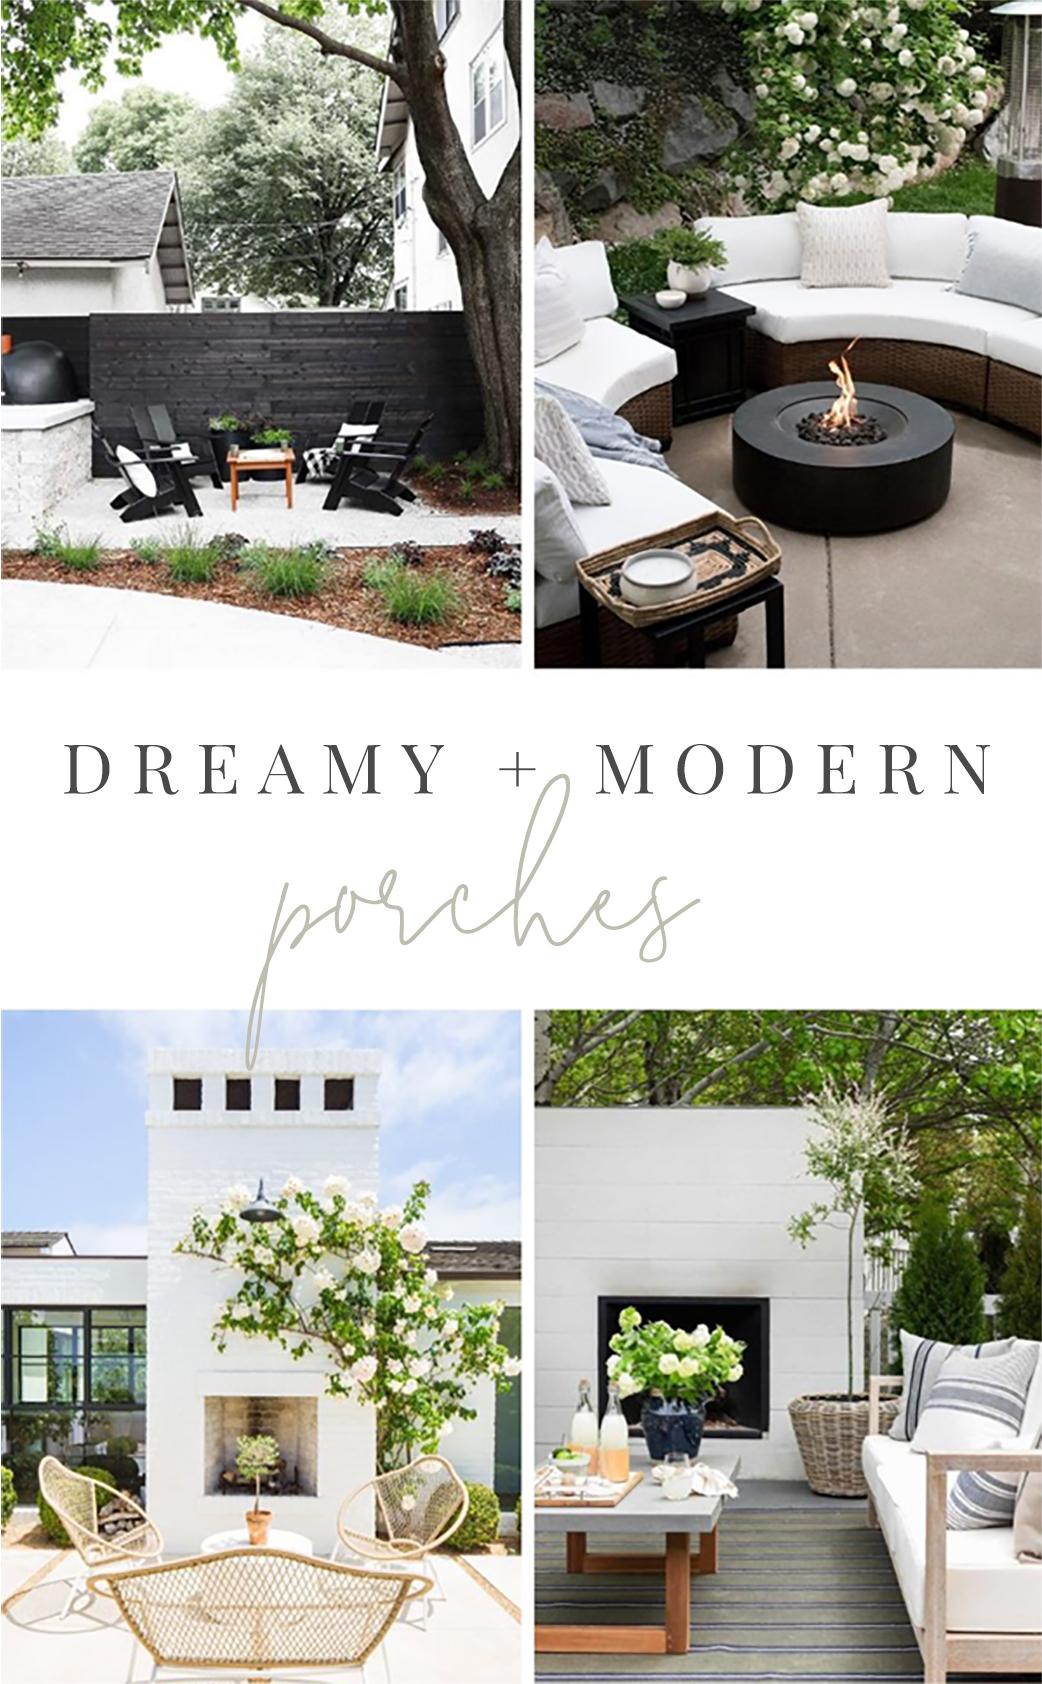 Modern Dreamy Porches.jpg